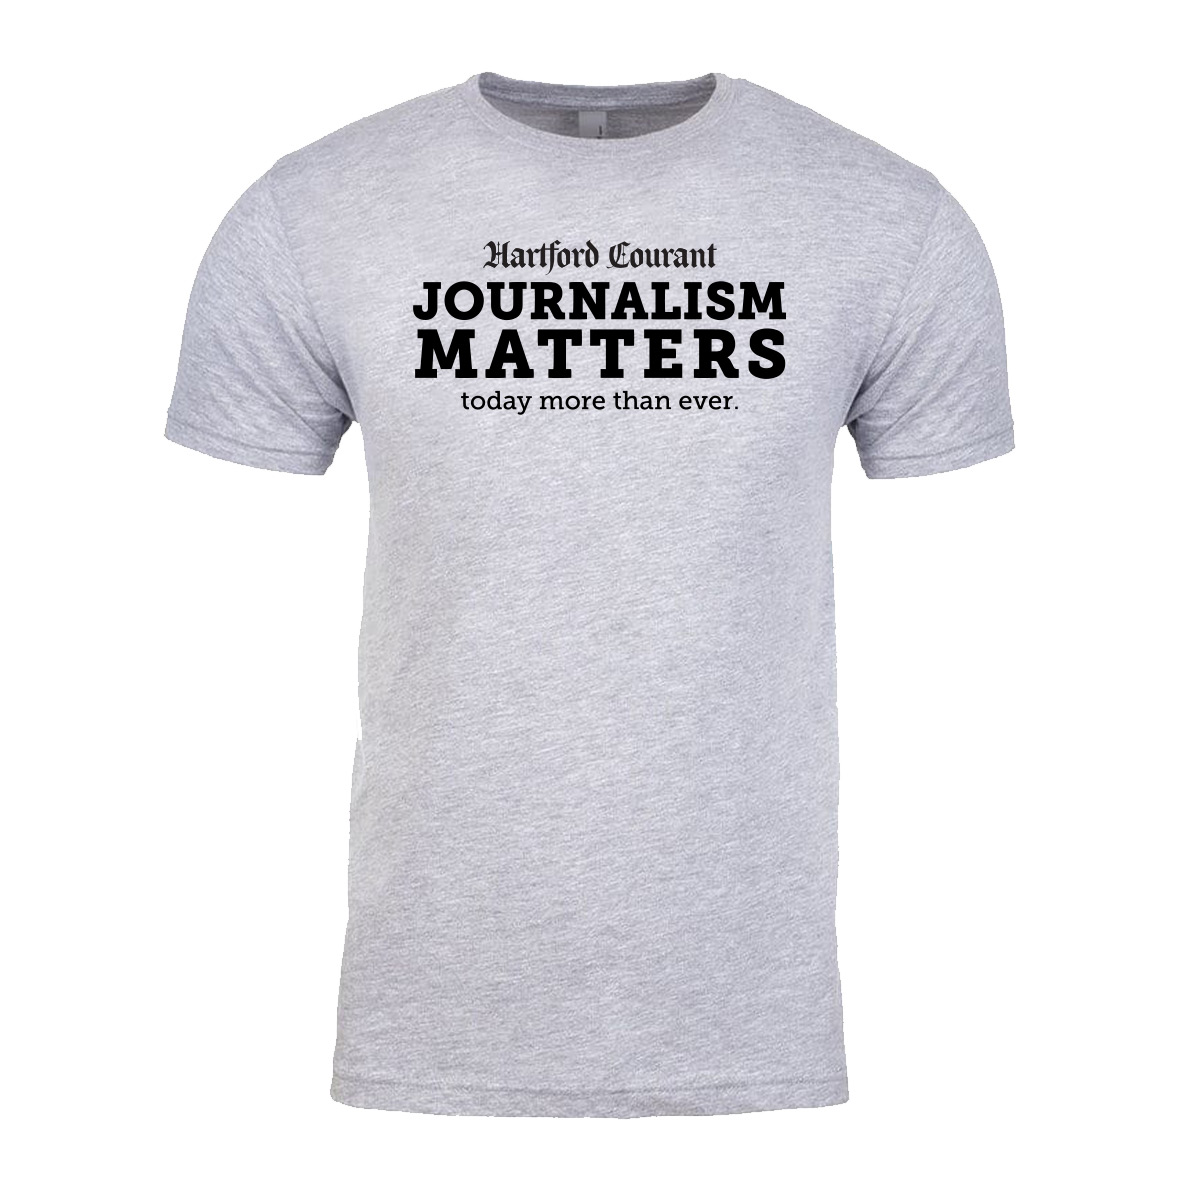 Hartford Courant Journalism Matters Shirt